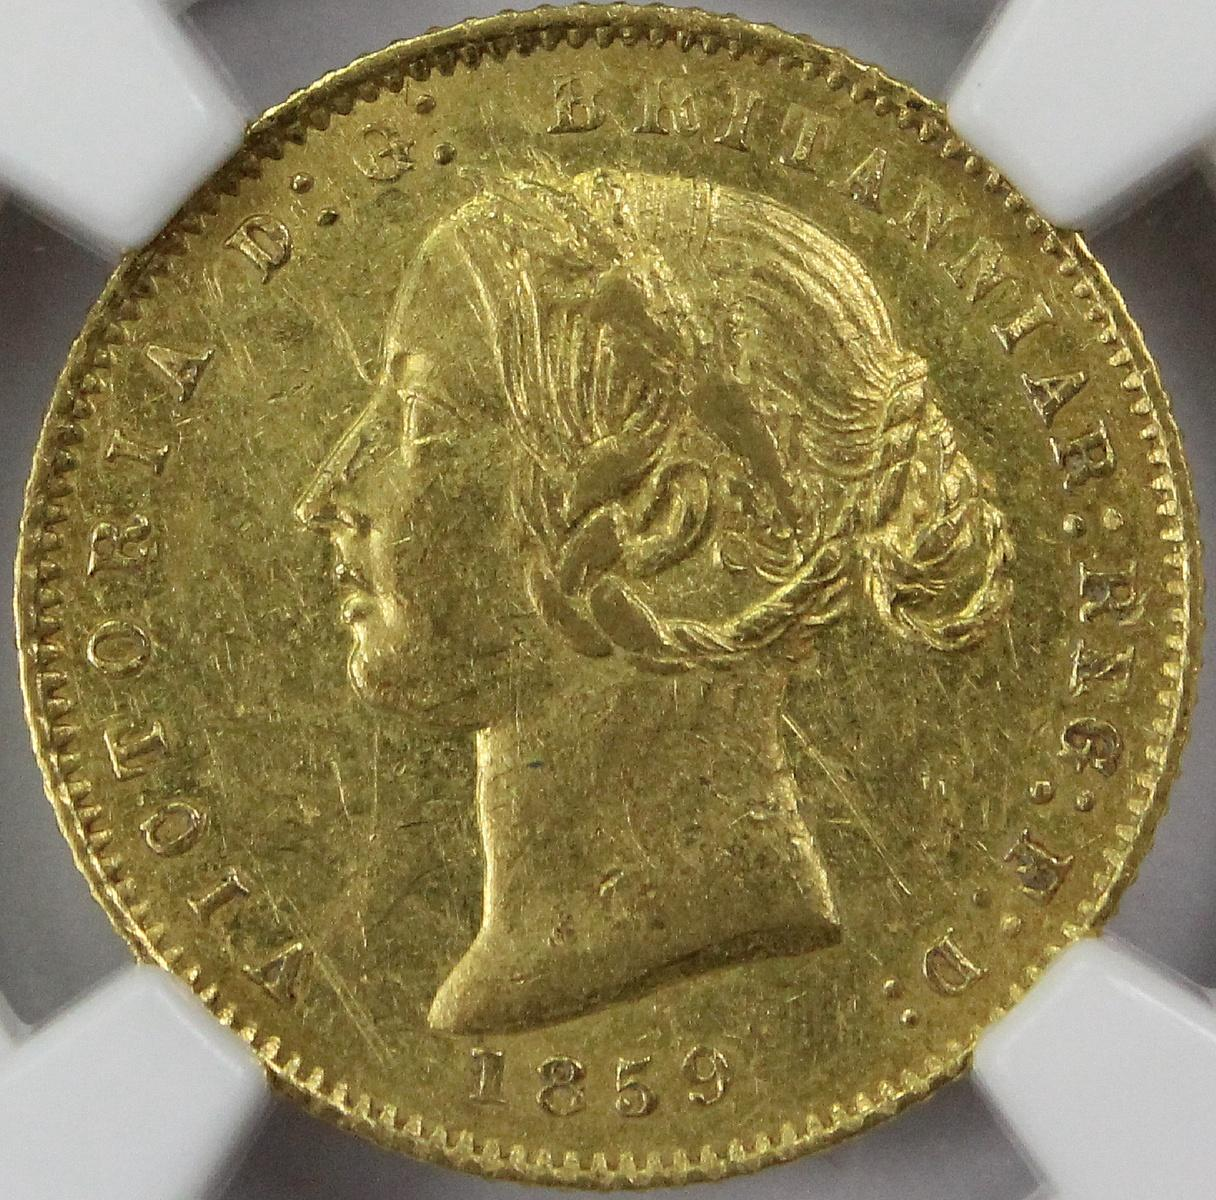 Australia. 1859 'Sydney Mint' Gold (0.916) Half Sovereign, PCGS AU55